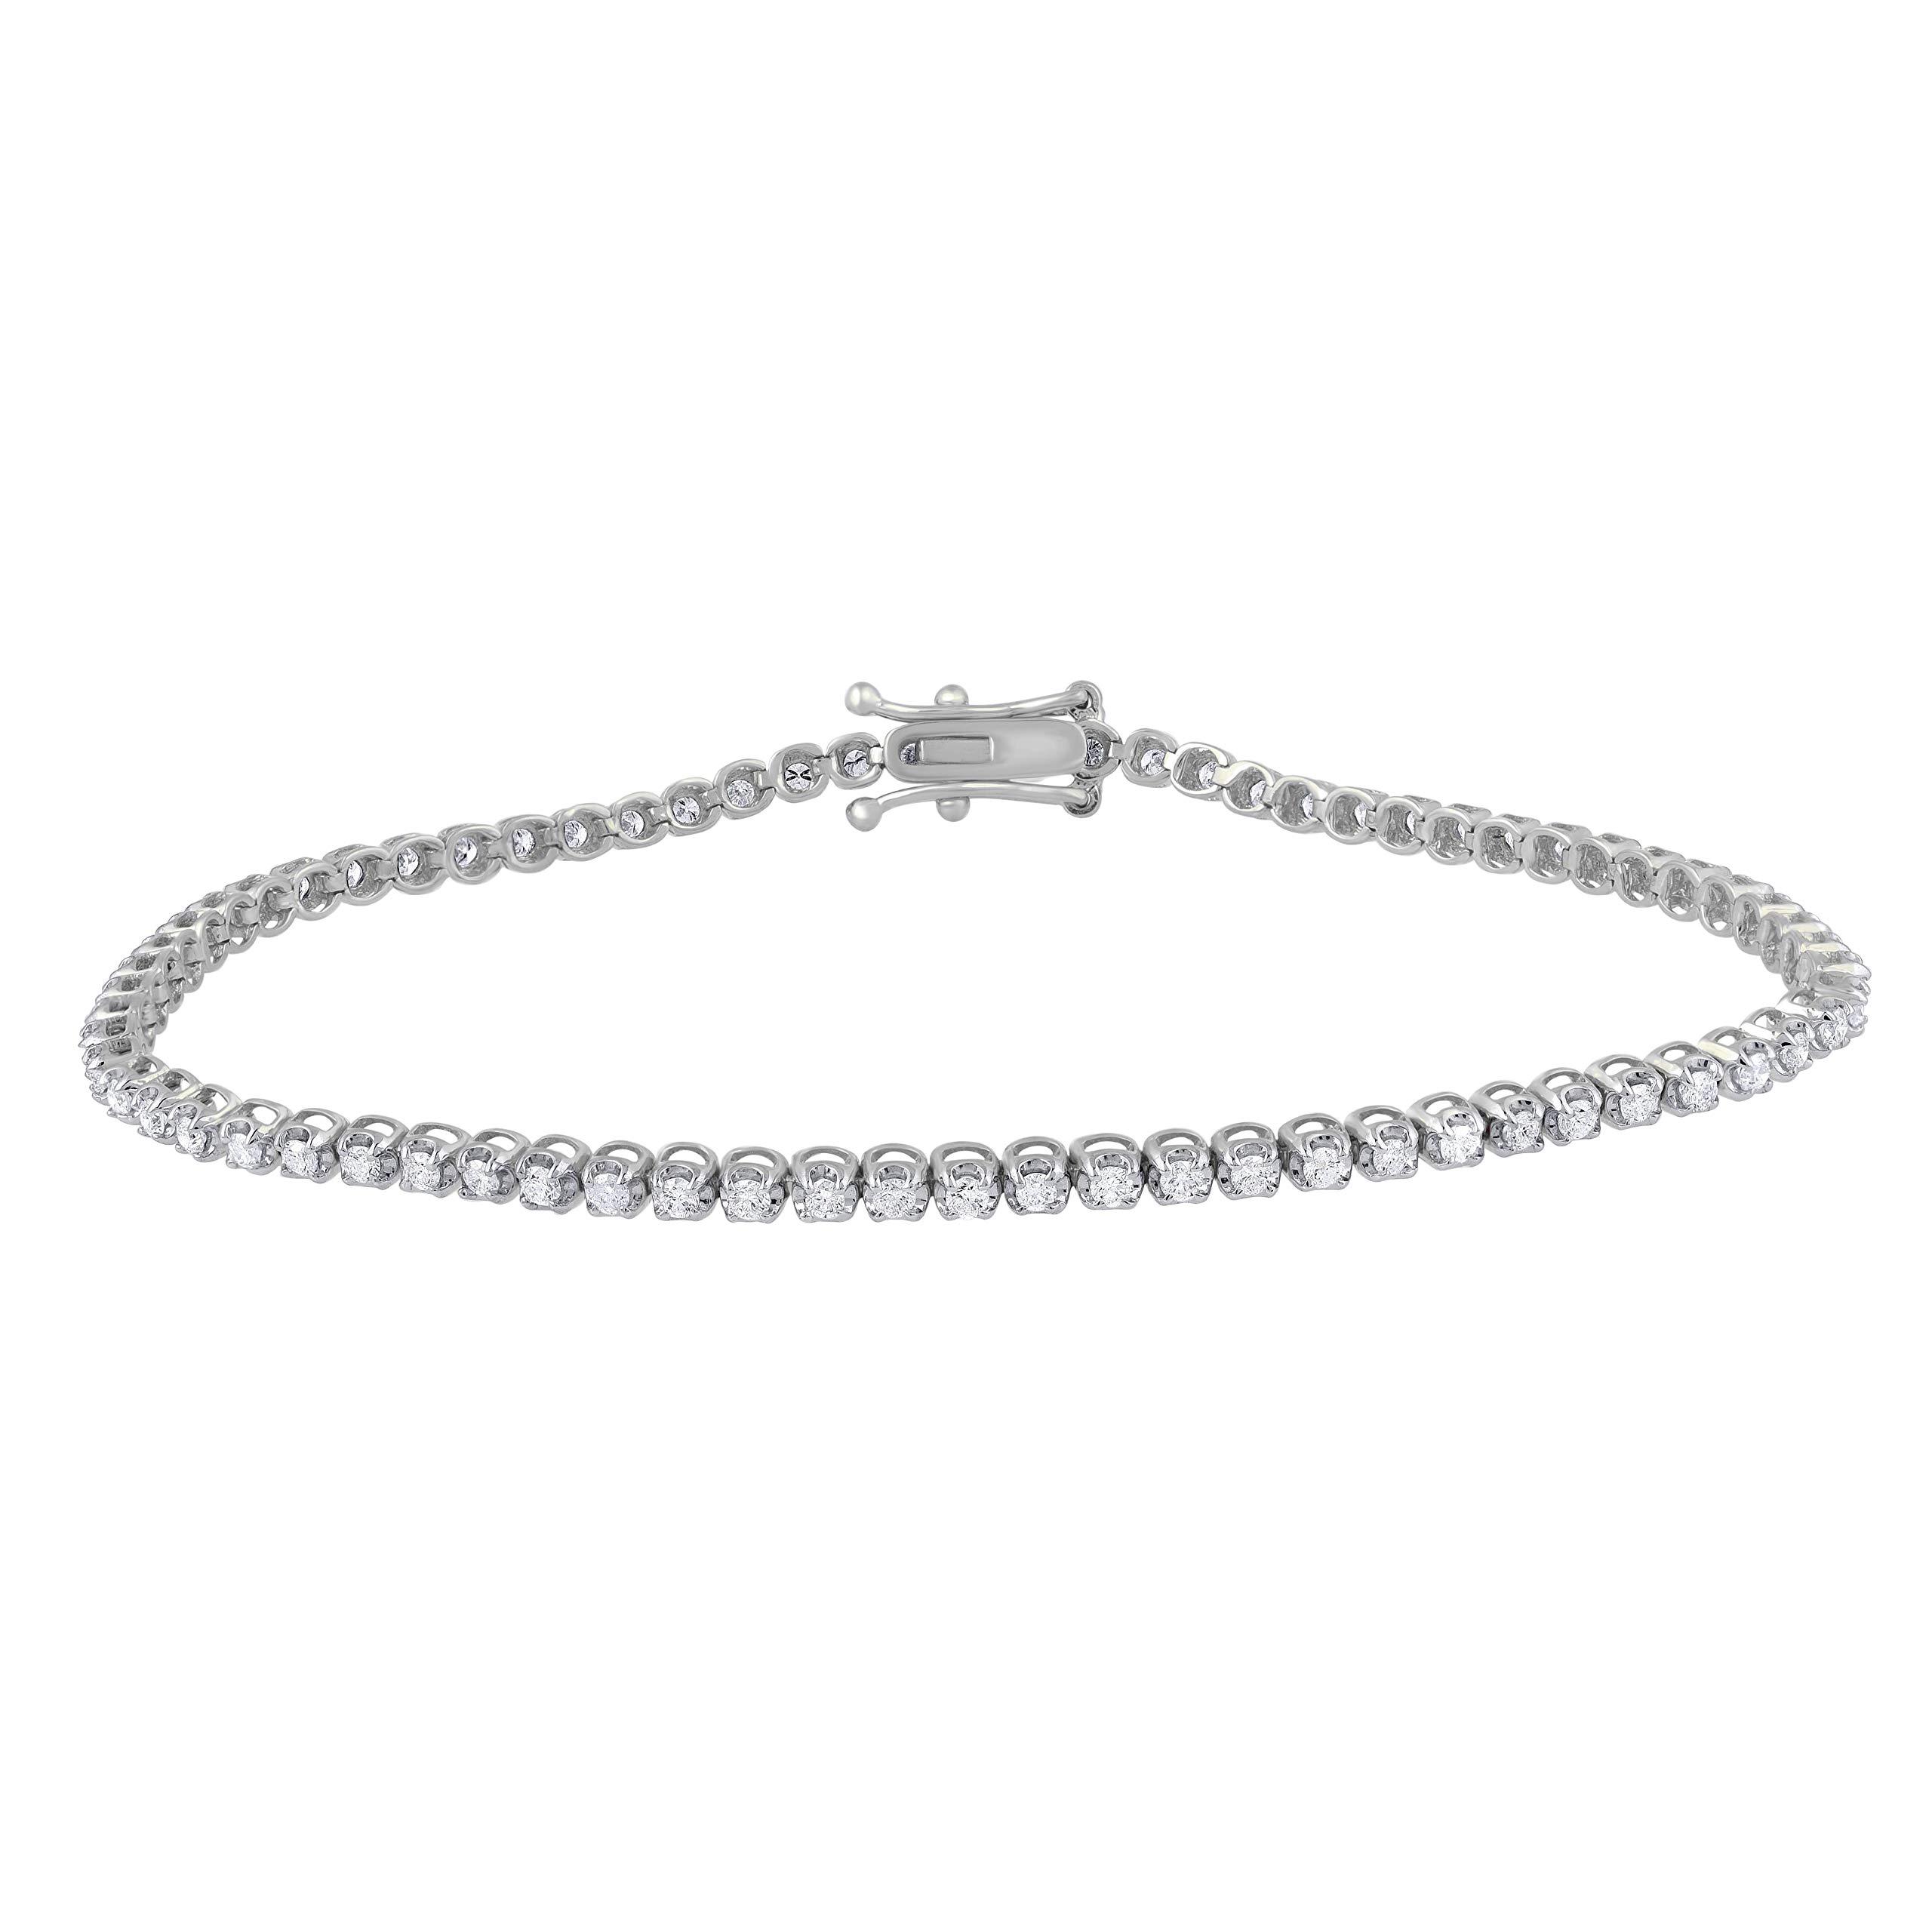 1.00 Carat Natural Diamond Bracelet 10K White Gold (G-H Color, I3 Clarity) Stylish Diamond Tennis Bracelet for Women Diamond Jewelry Gifts for Women by TJD